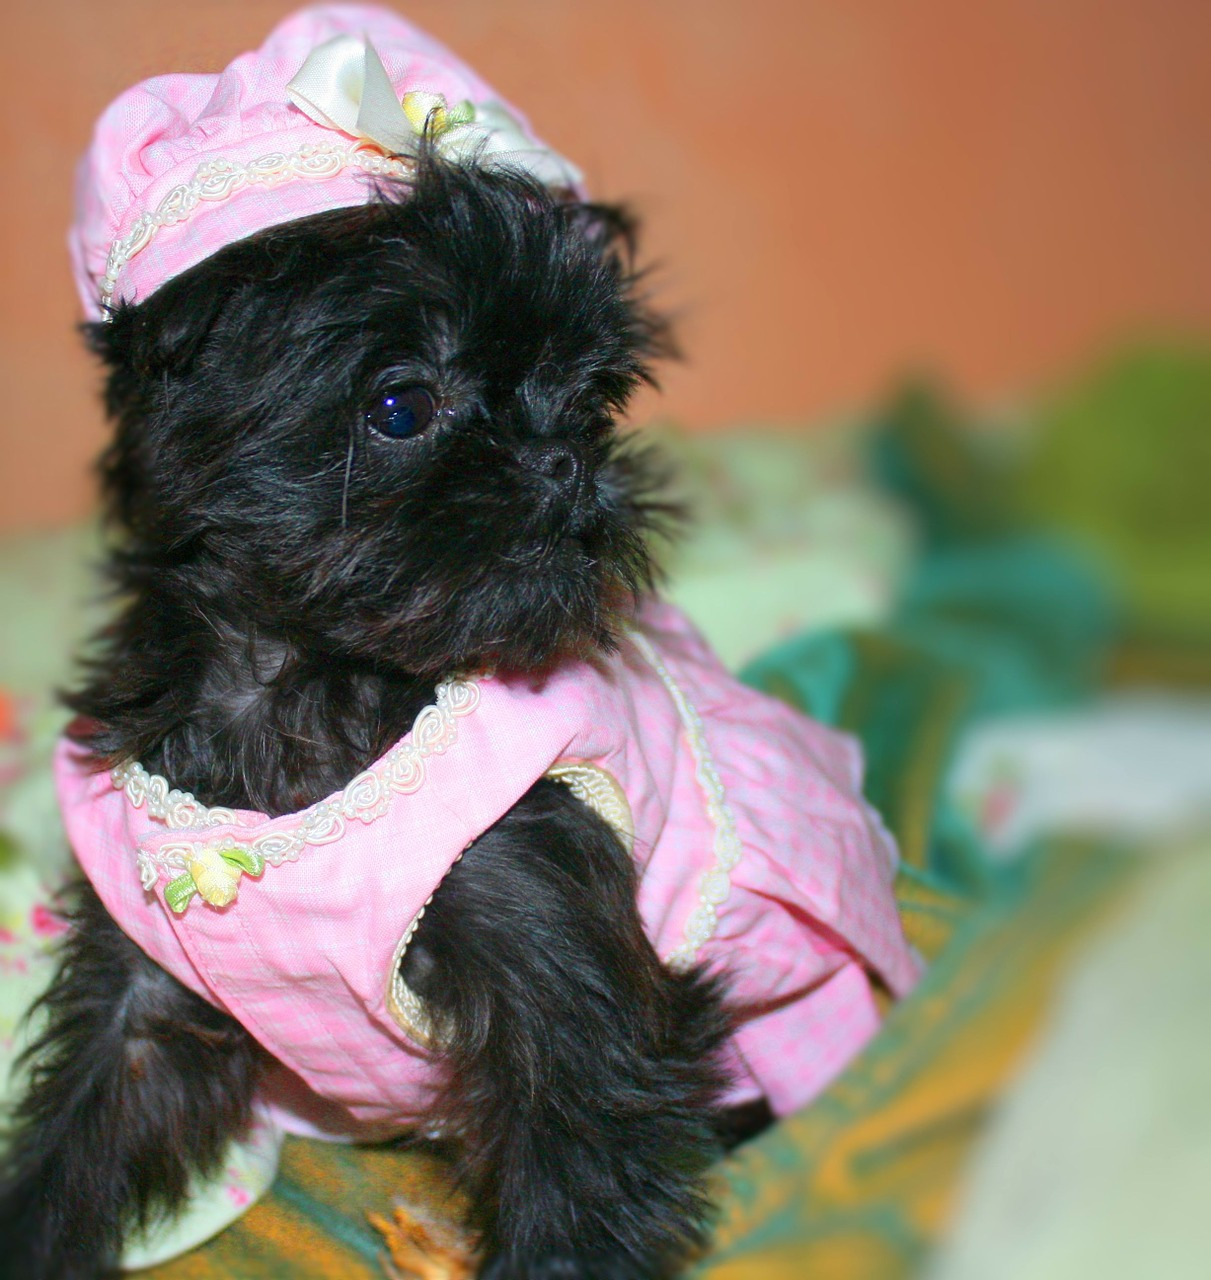 verrückte Hundenamen und lustige Hundeklamotten